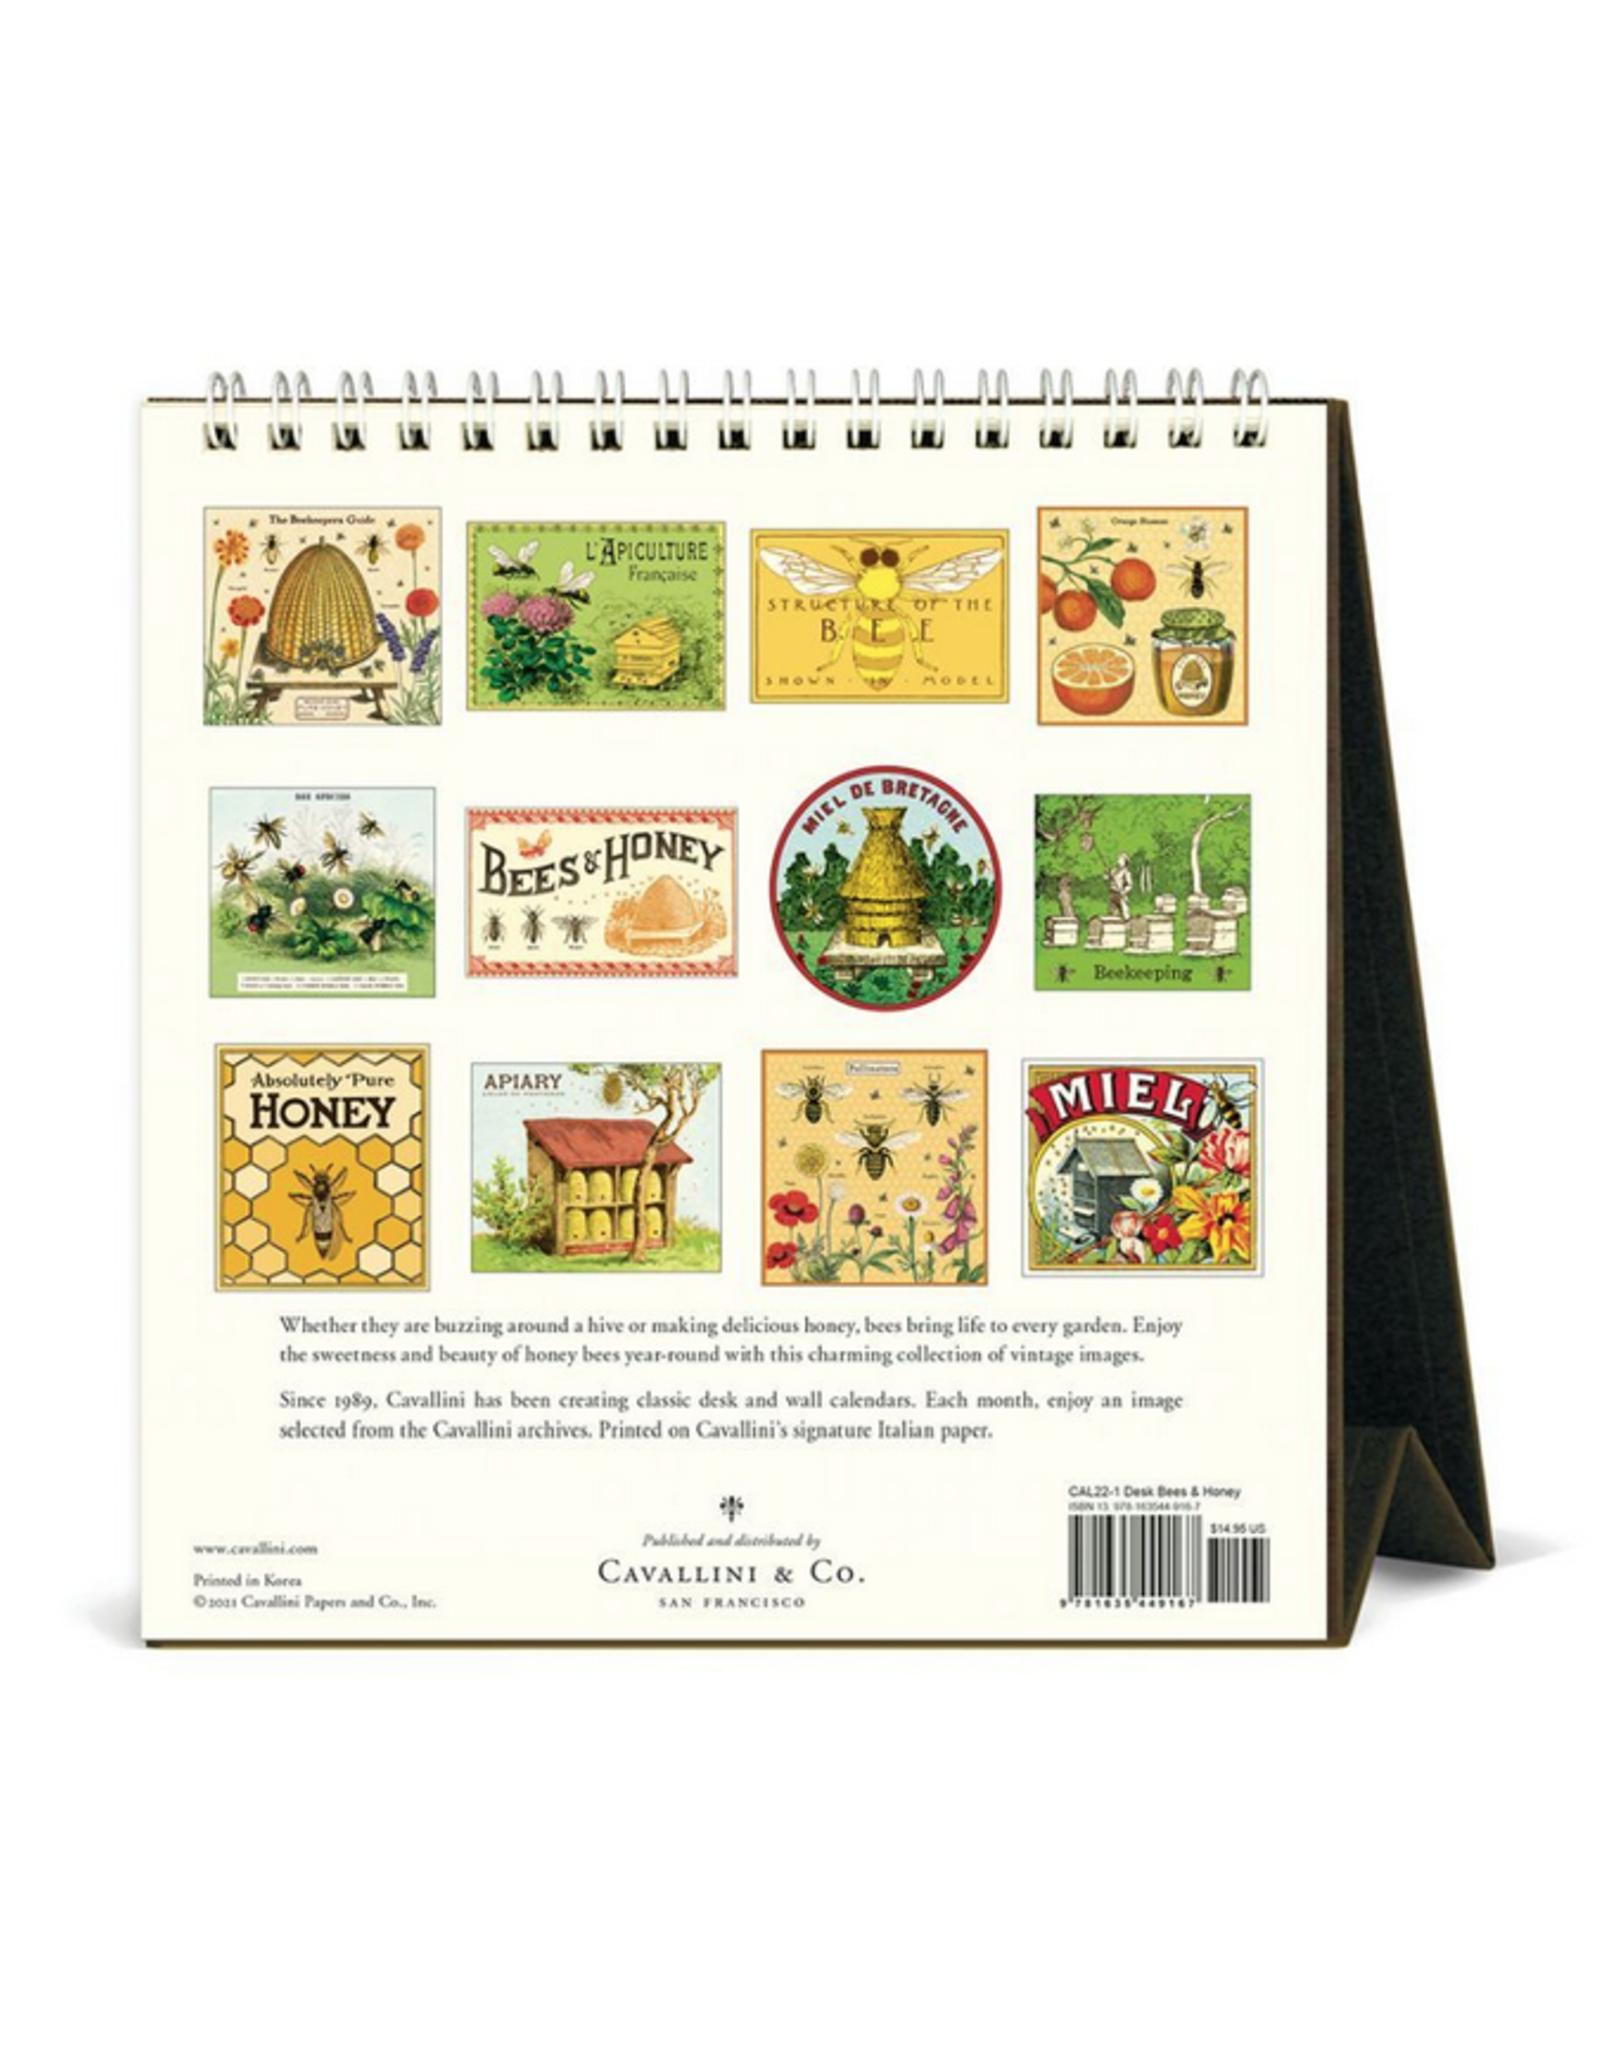 2022 Desk Calendar: Bees & Honey